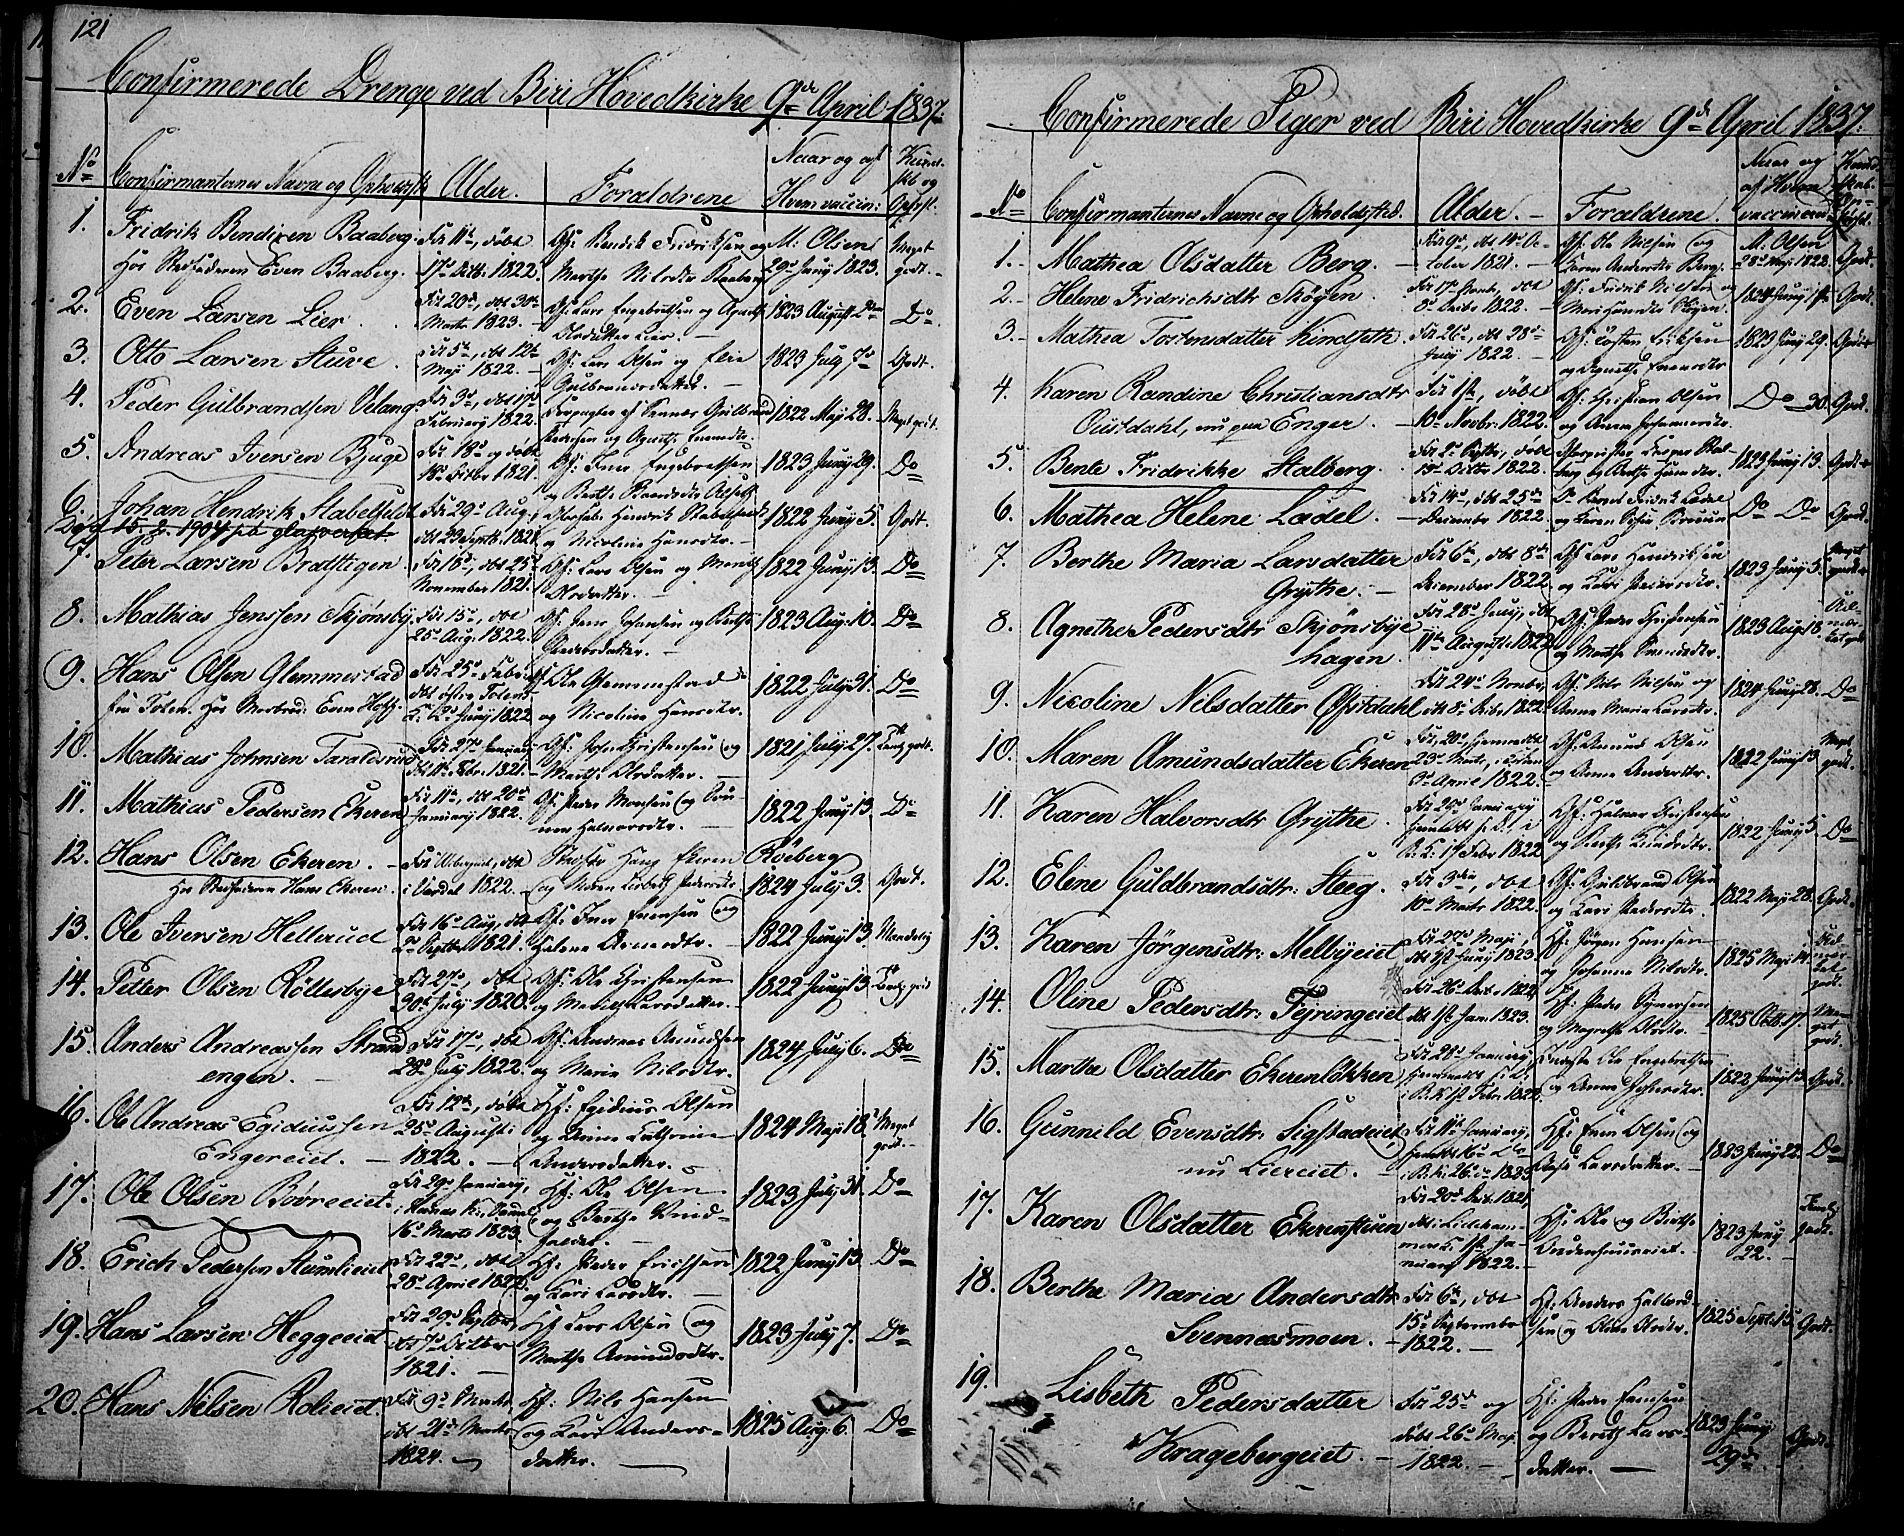 SAH, Biri prestekontor, Ministerialbok nr. 4, 1829-1842, s. 121